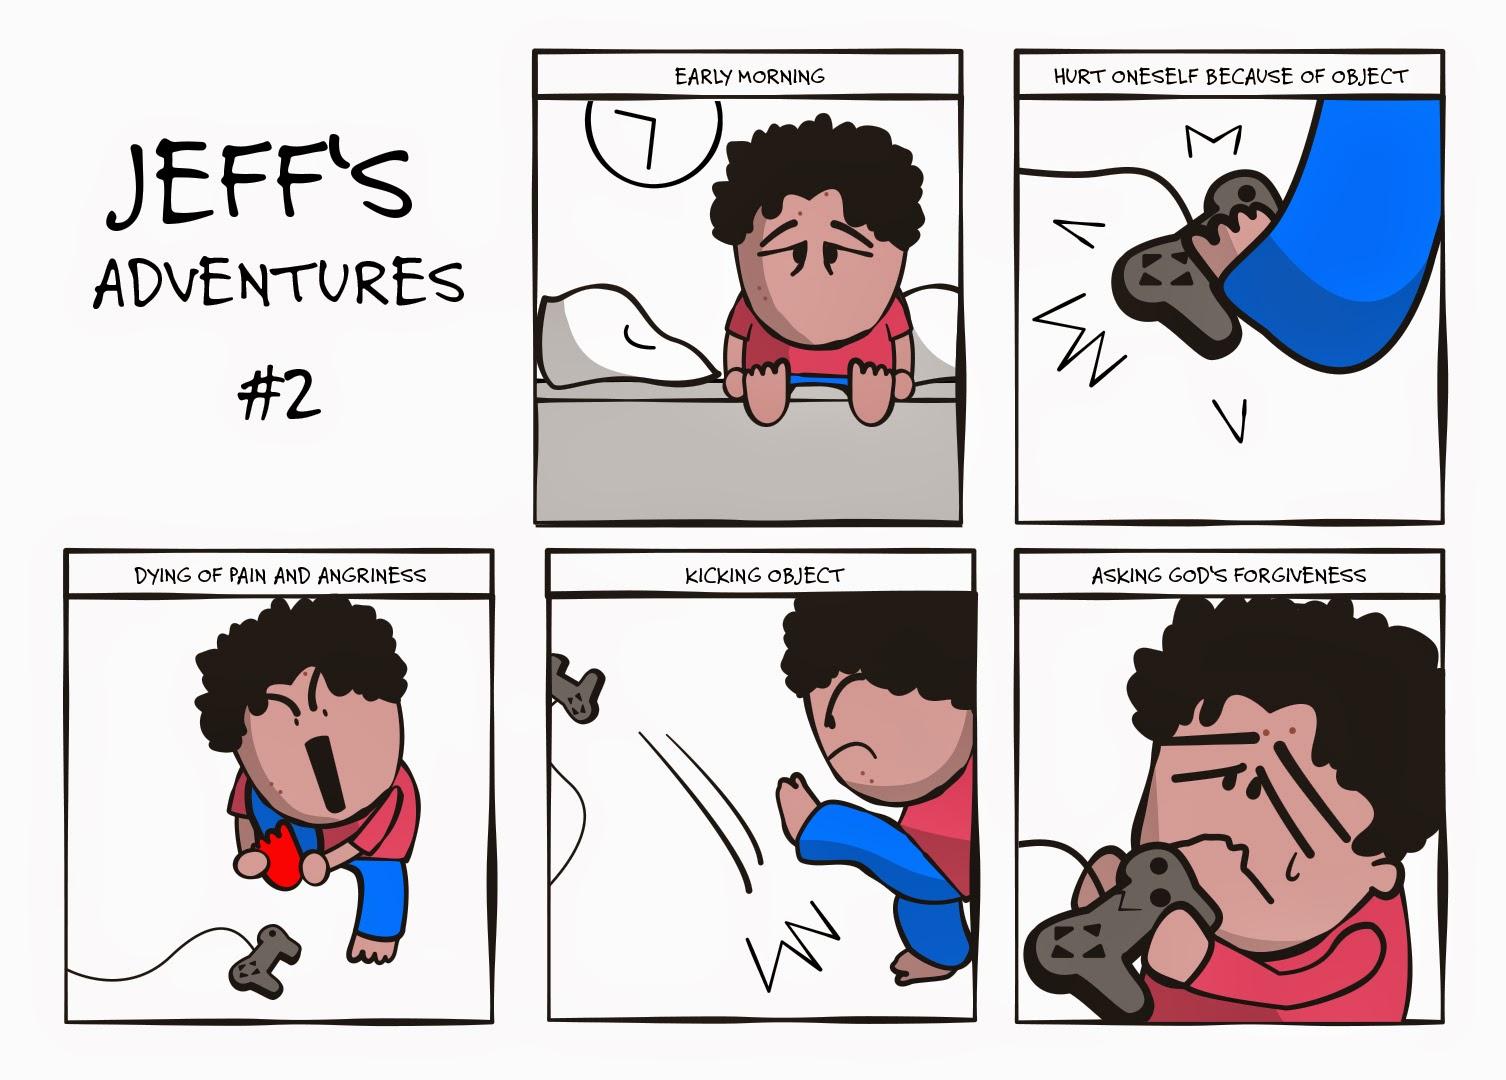 JEFF'S ADVENTURES #2